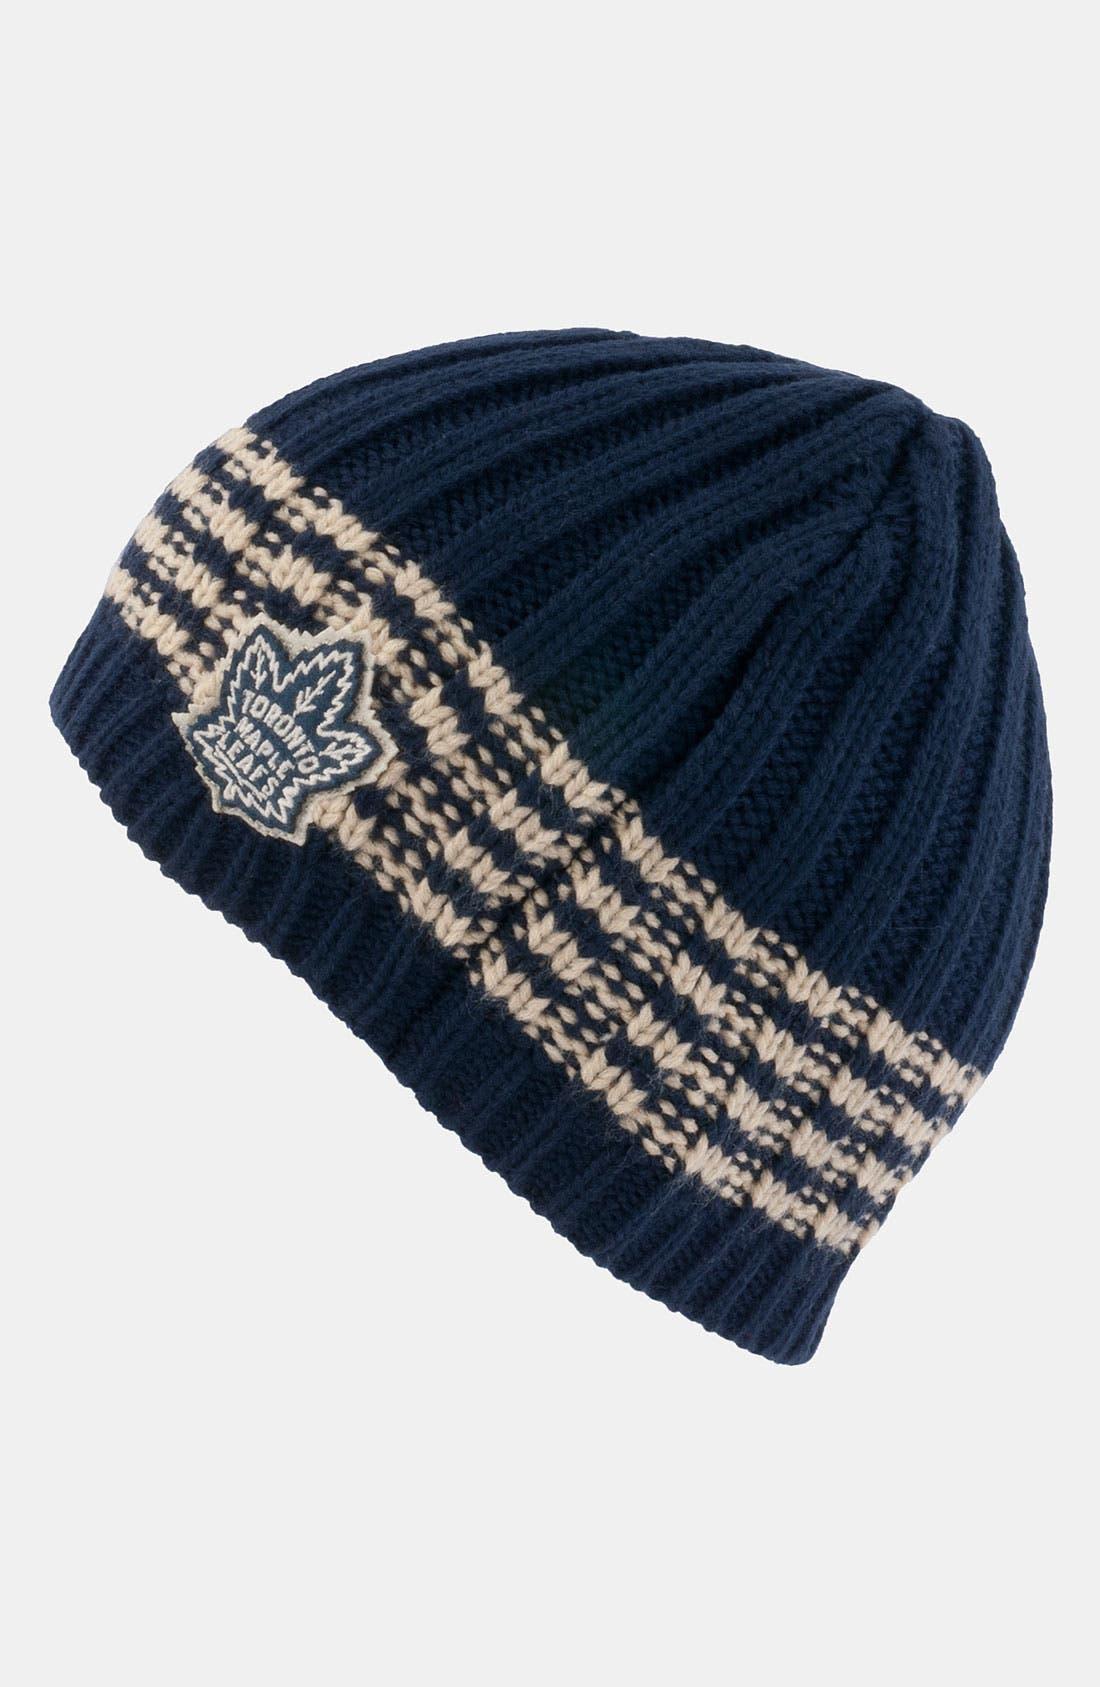 Alternate Image 1 Selected - American Needle 'Toronto Maple Leafs - Targhee' Knit Hat